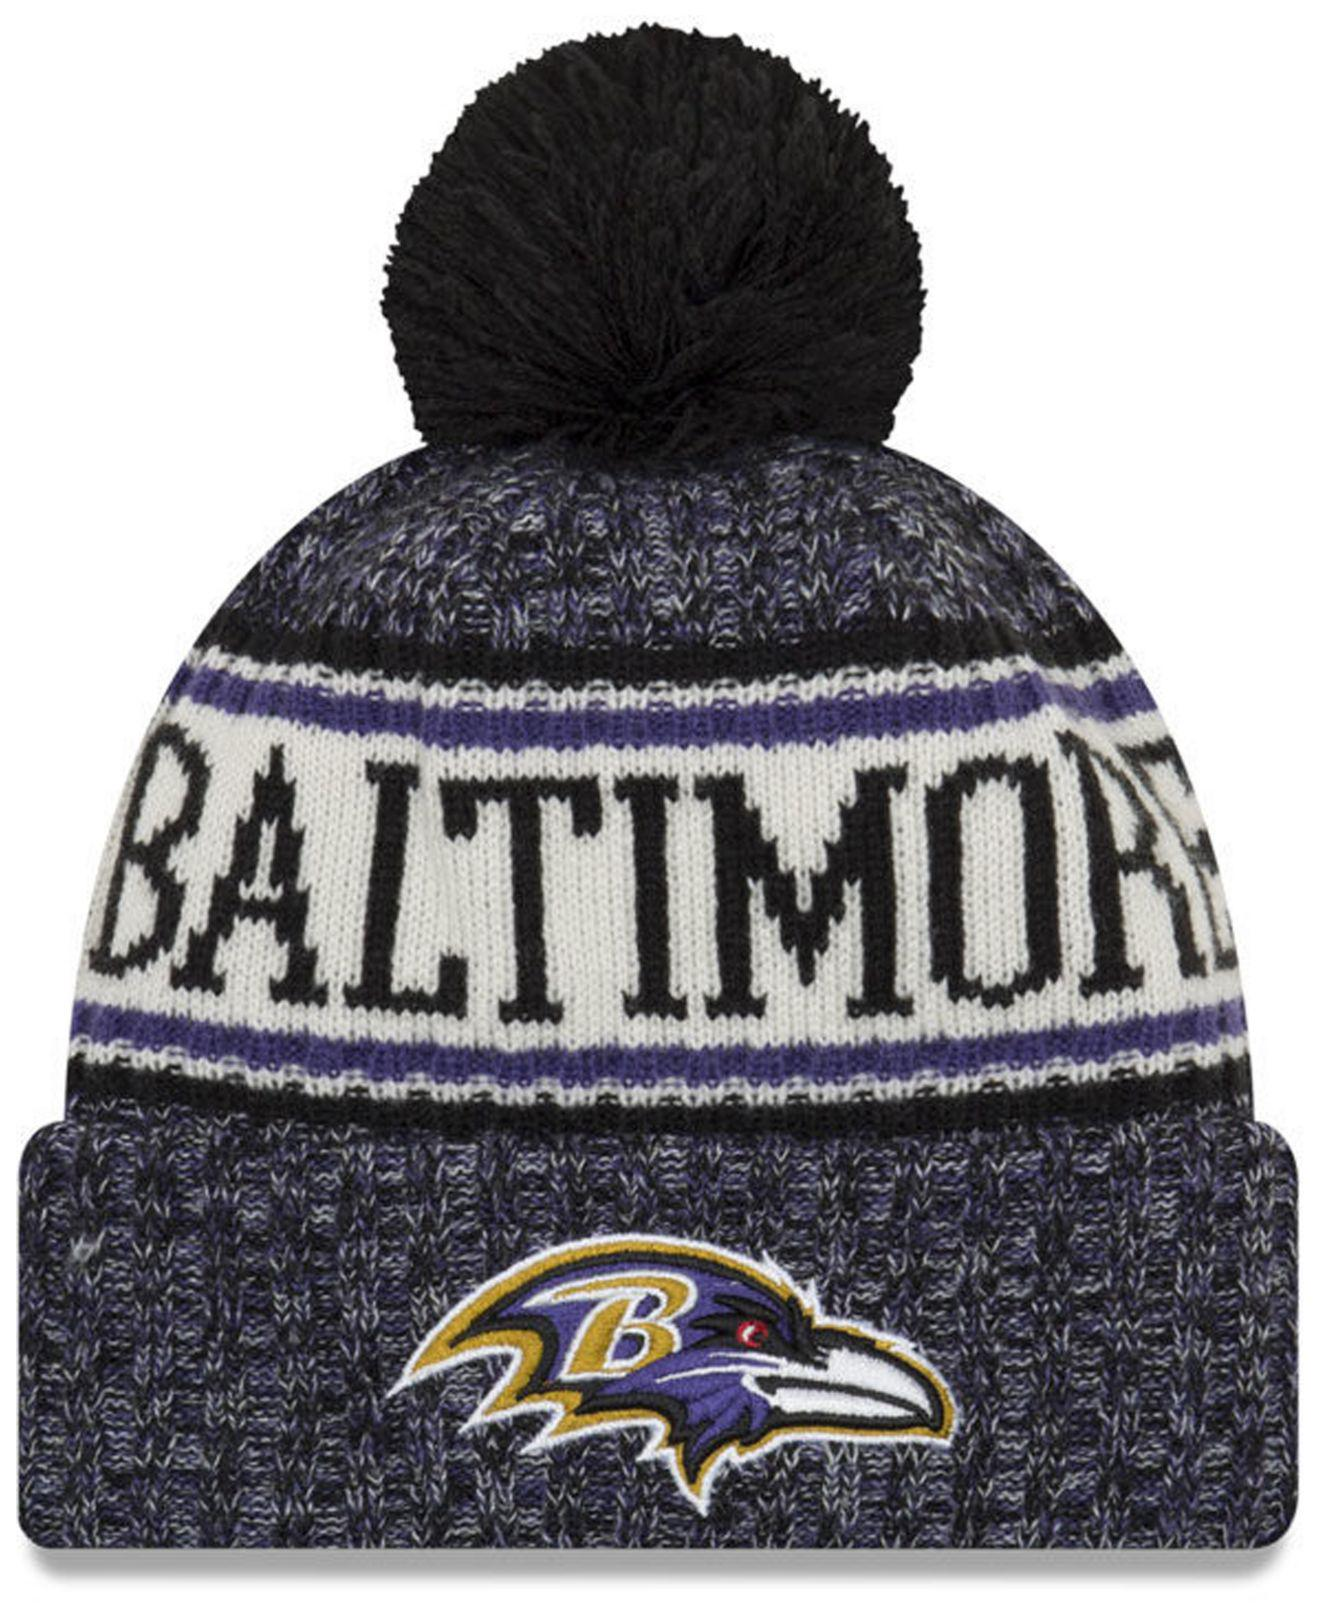 Lyst - KTZ Baltimore Ravens Sport Knit Hat in Purple for Men 34adda2f5